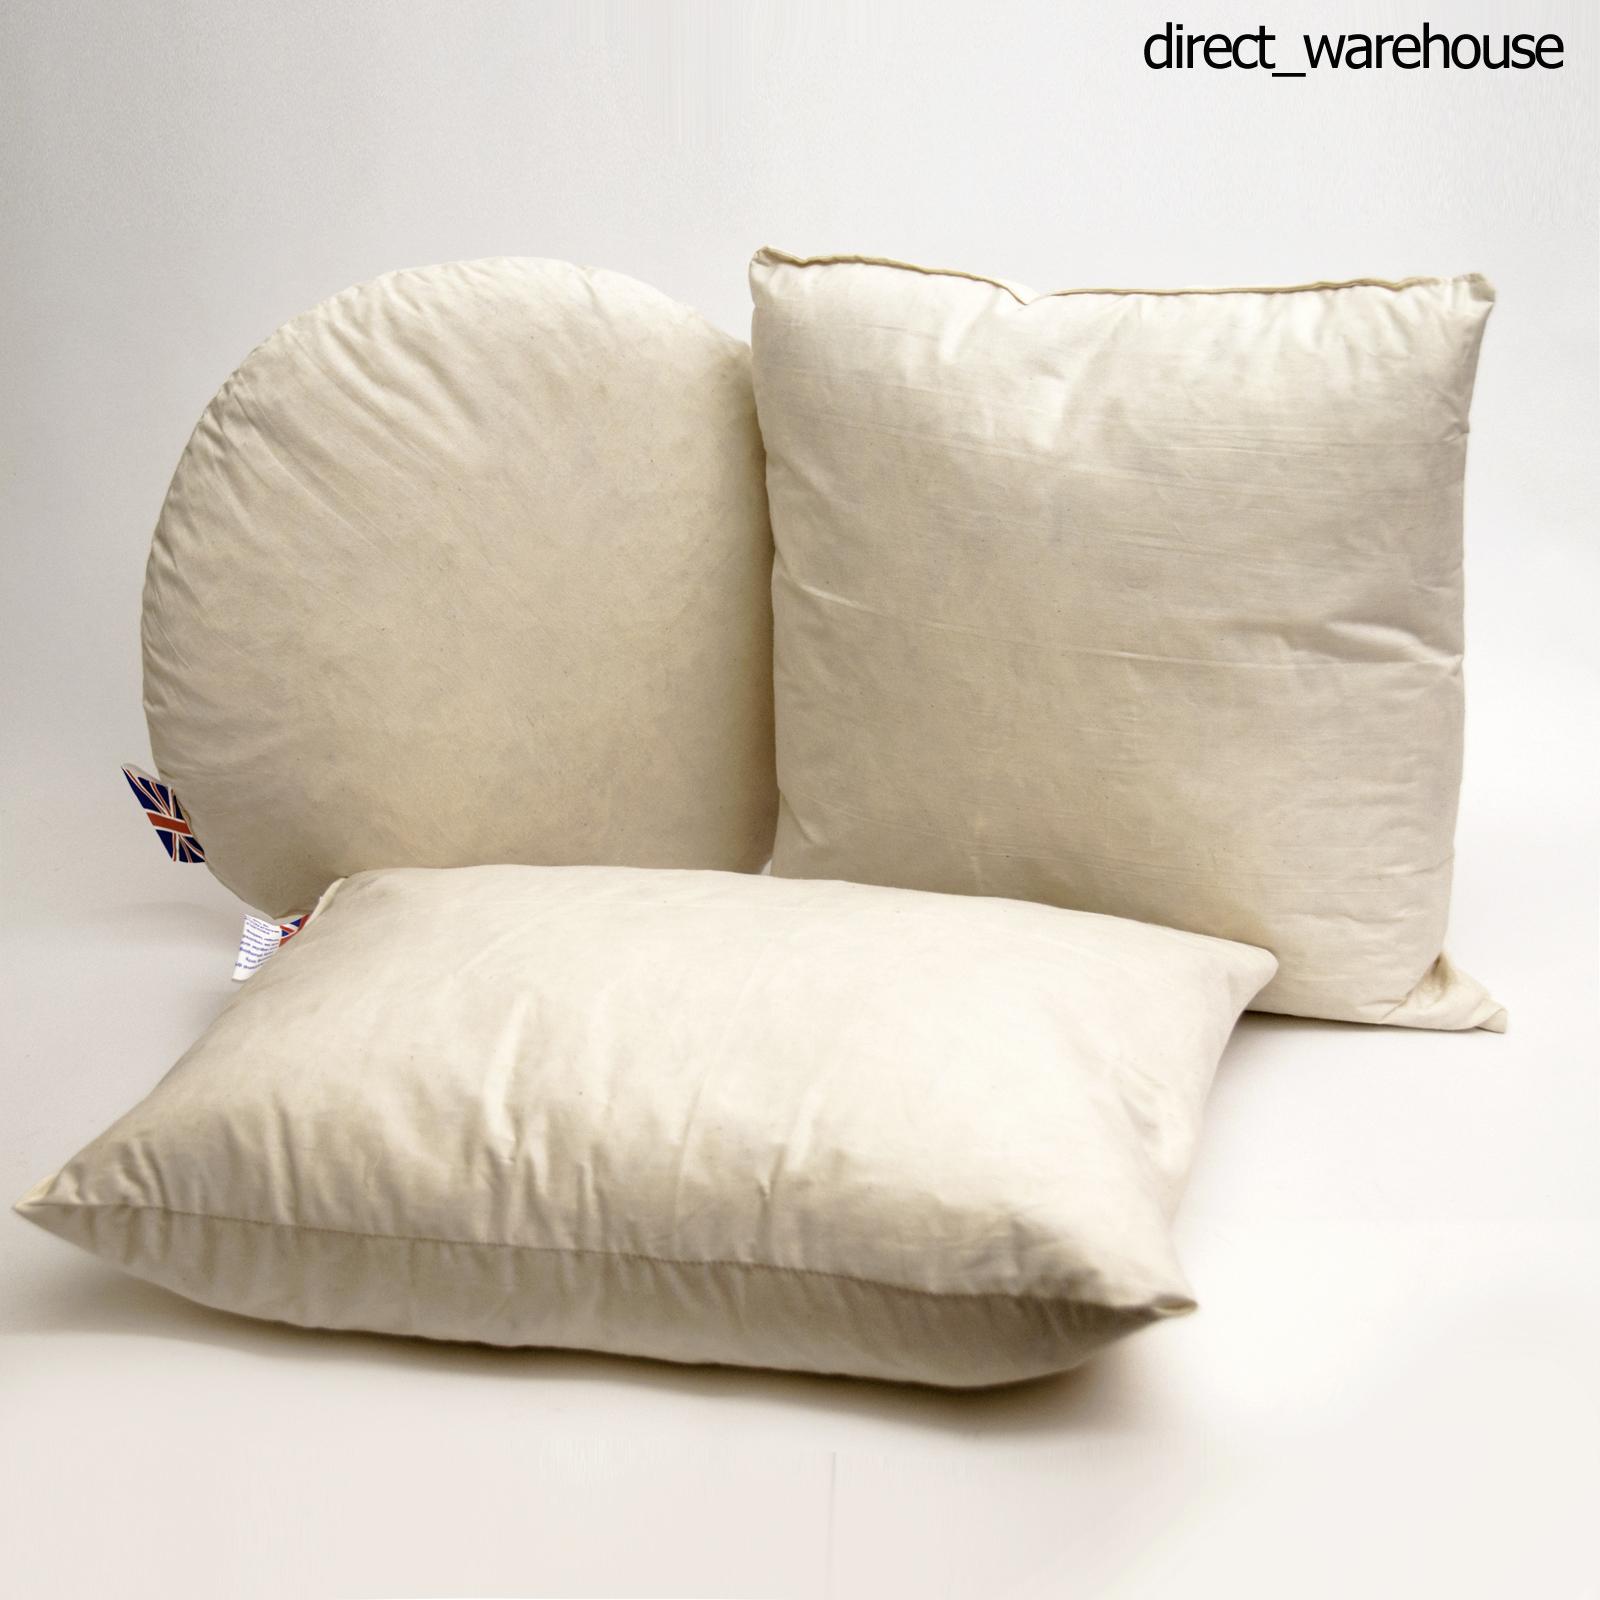 kissen f llung einsatz kissen streu f ller hohlfaser mikrofaser entenfeder ebay. Black Bedroom Furniture Sets. Home Design Ideas